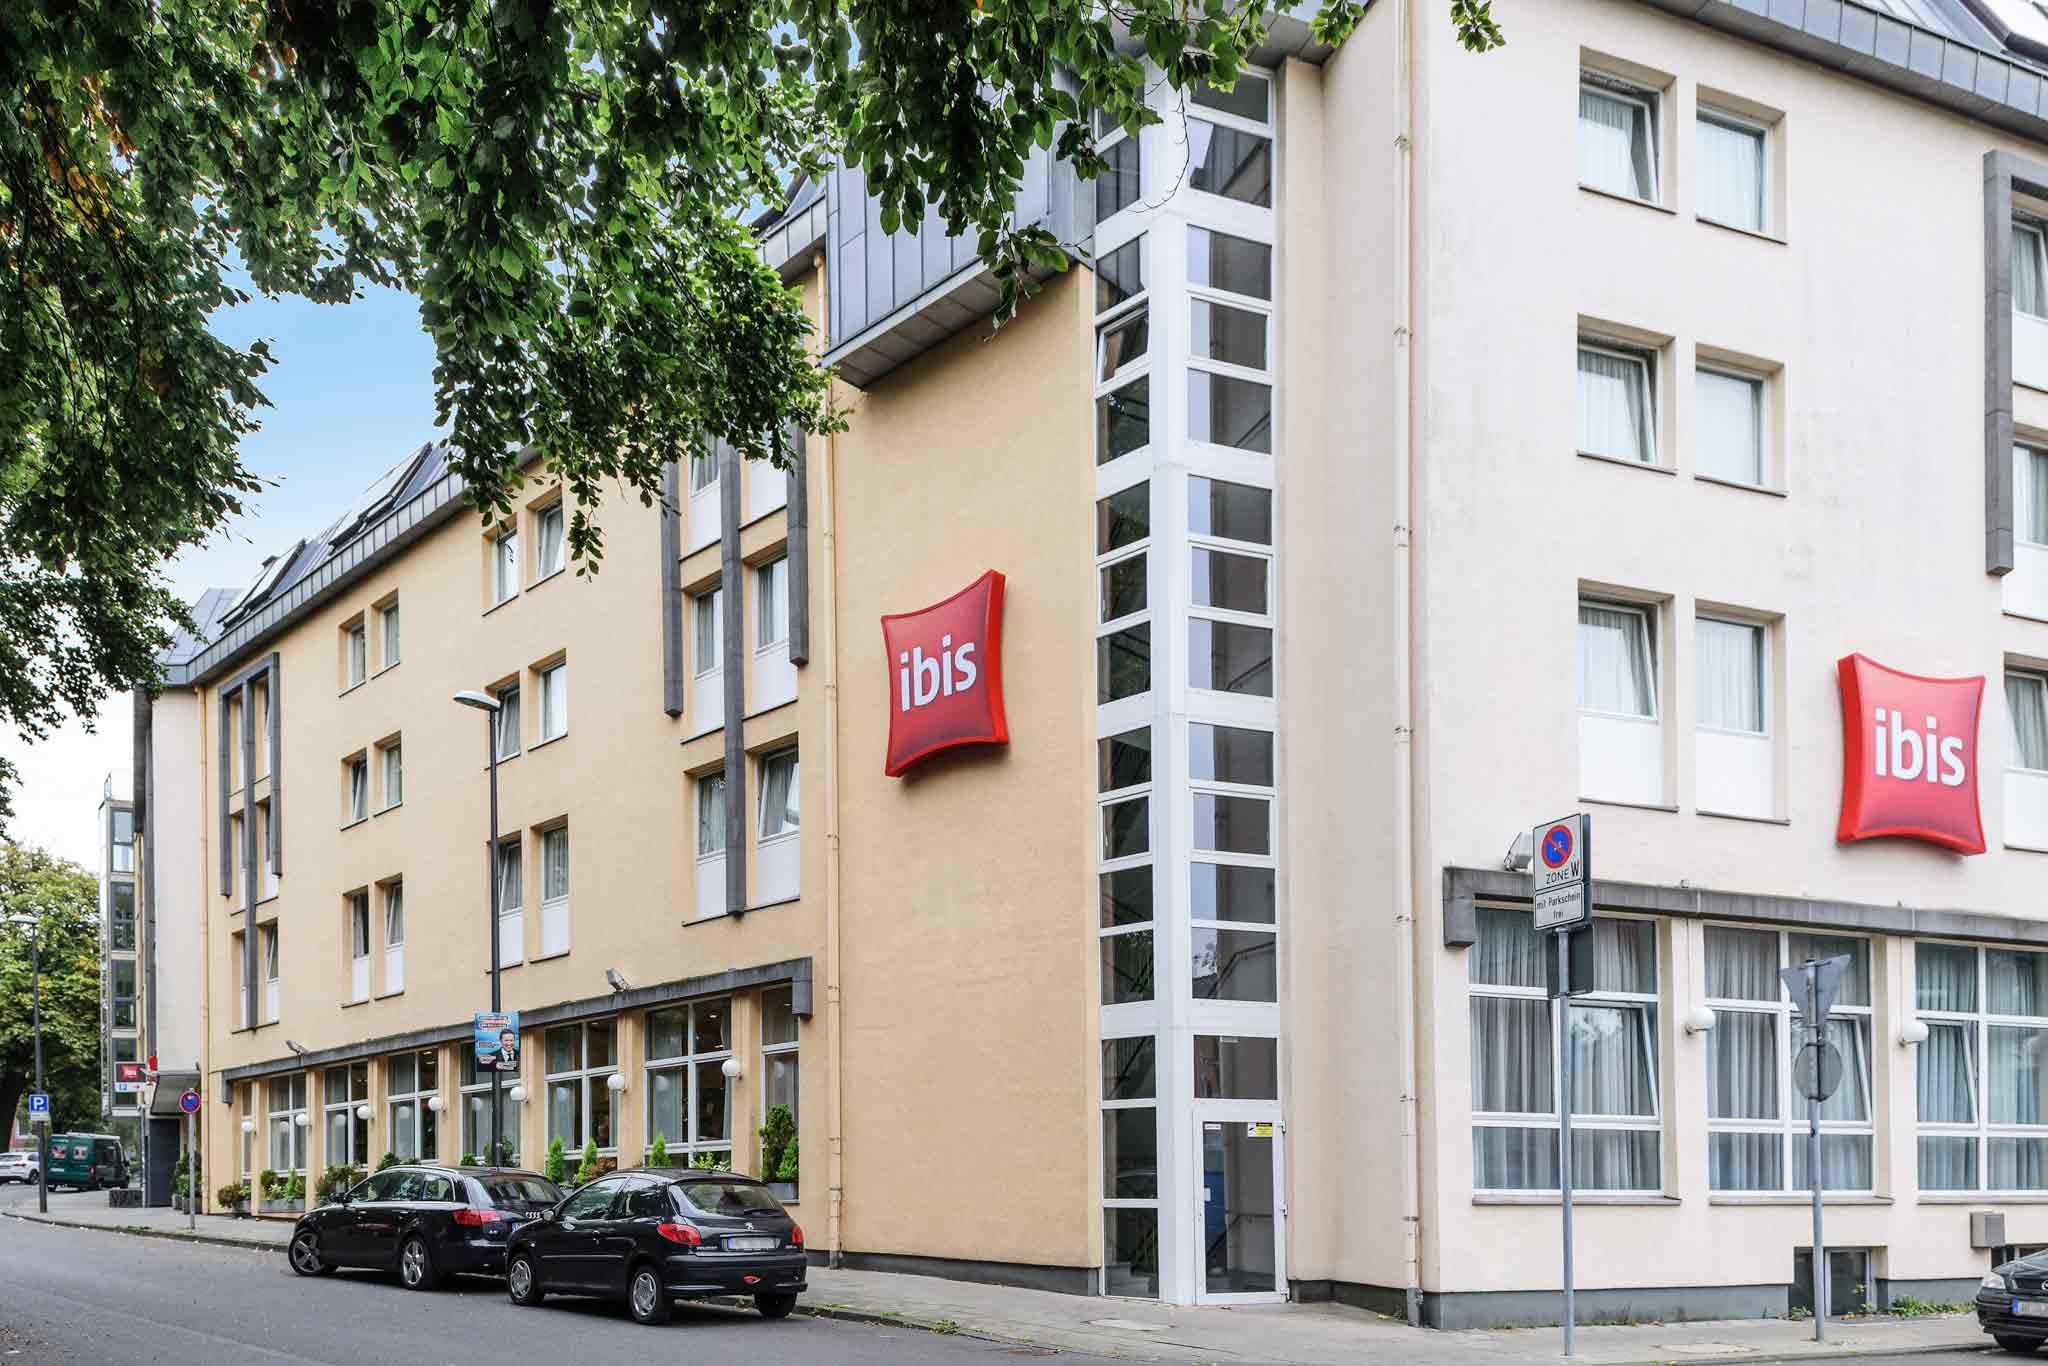 Ibis Hotel Aachen Marschiertor La Chapelle Aachen